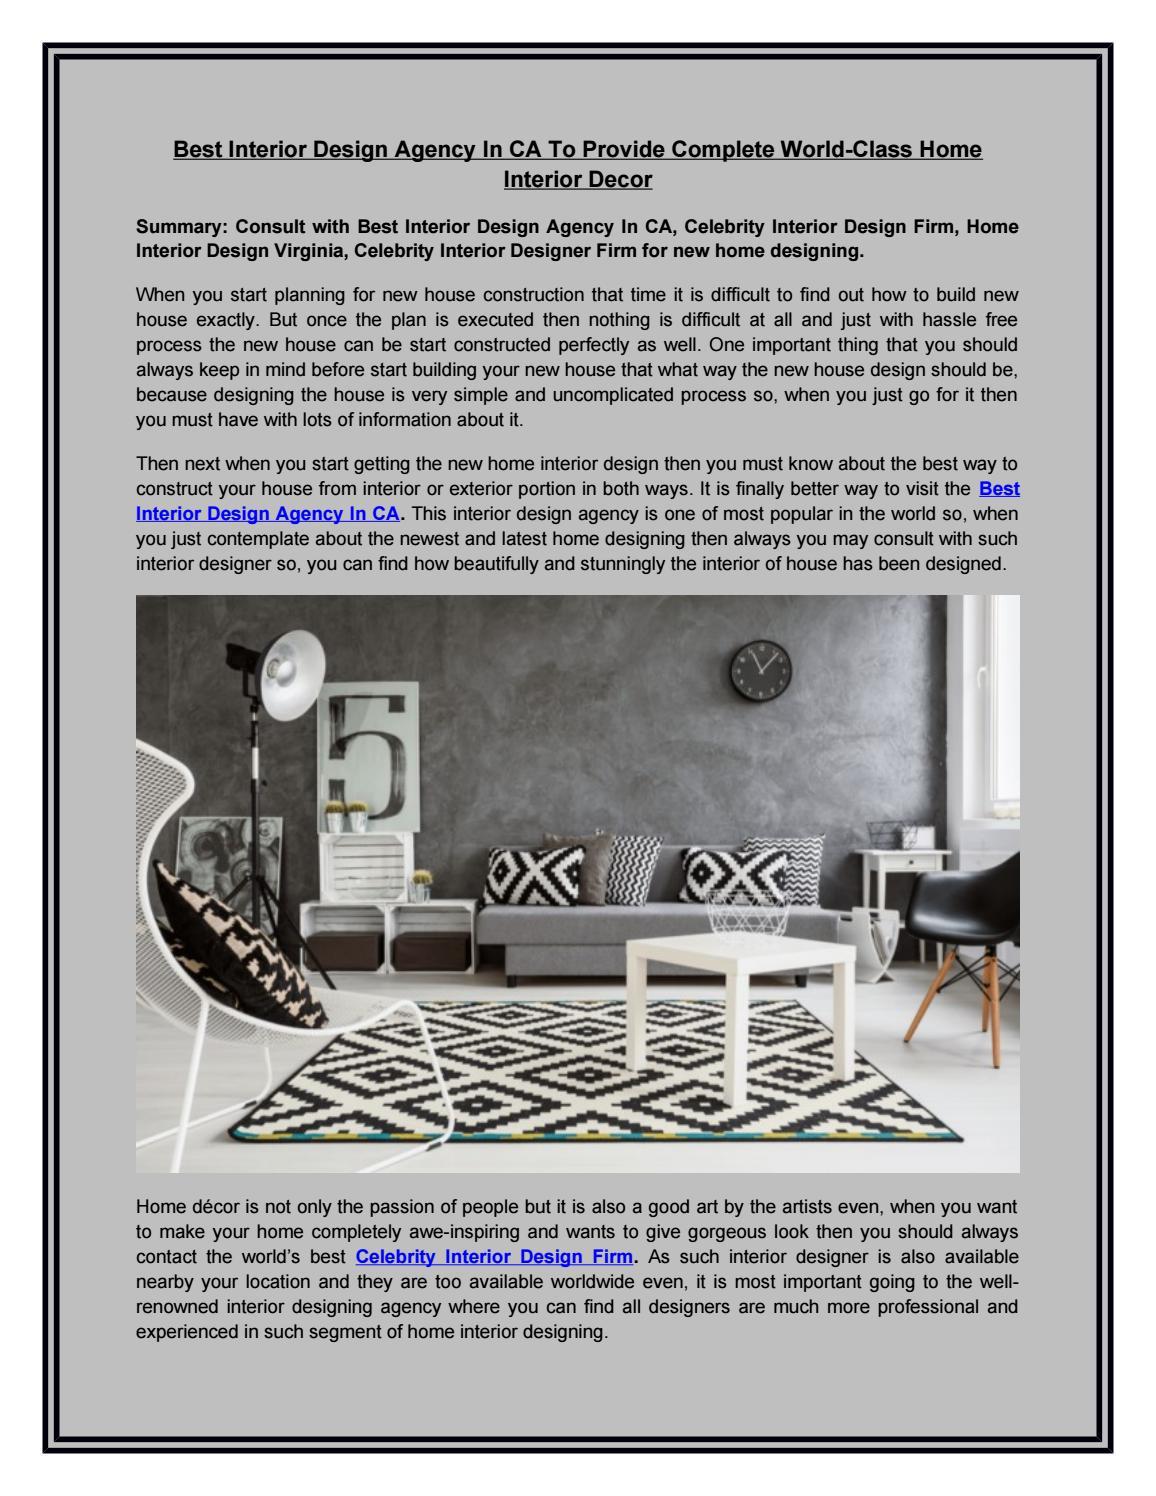 Interior Design Agency In CA | Celebrity Interior Design